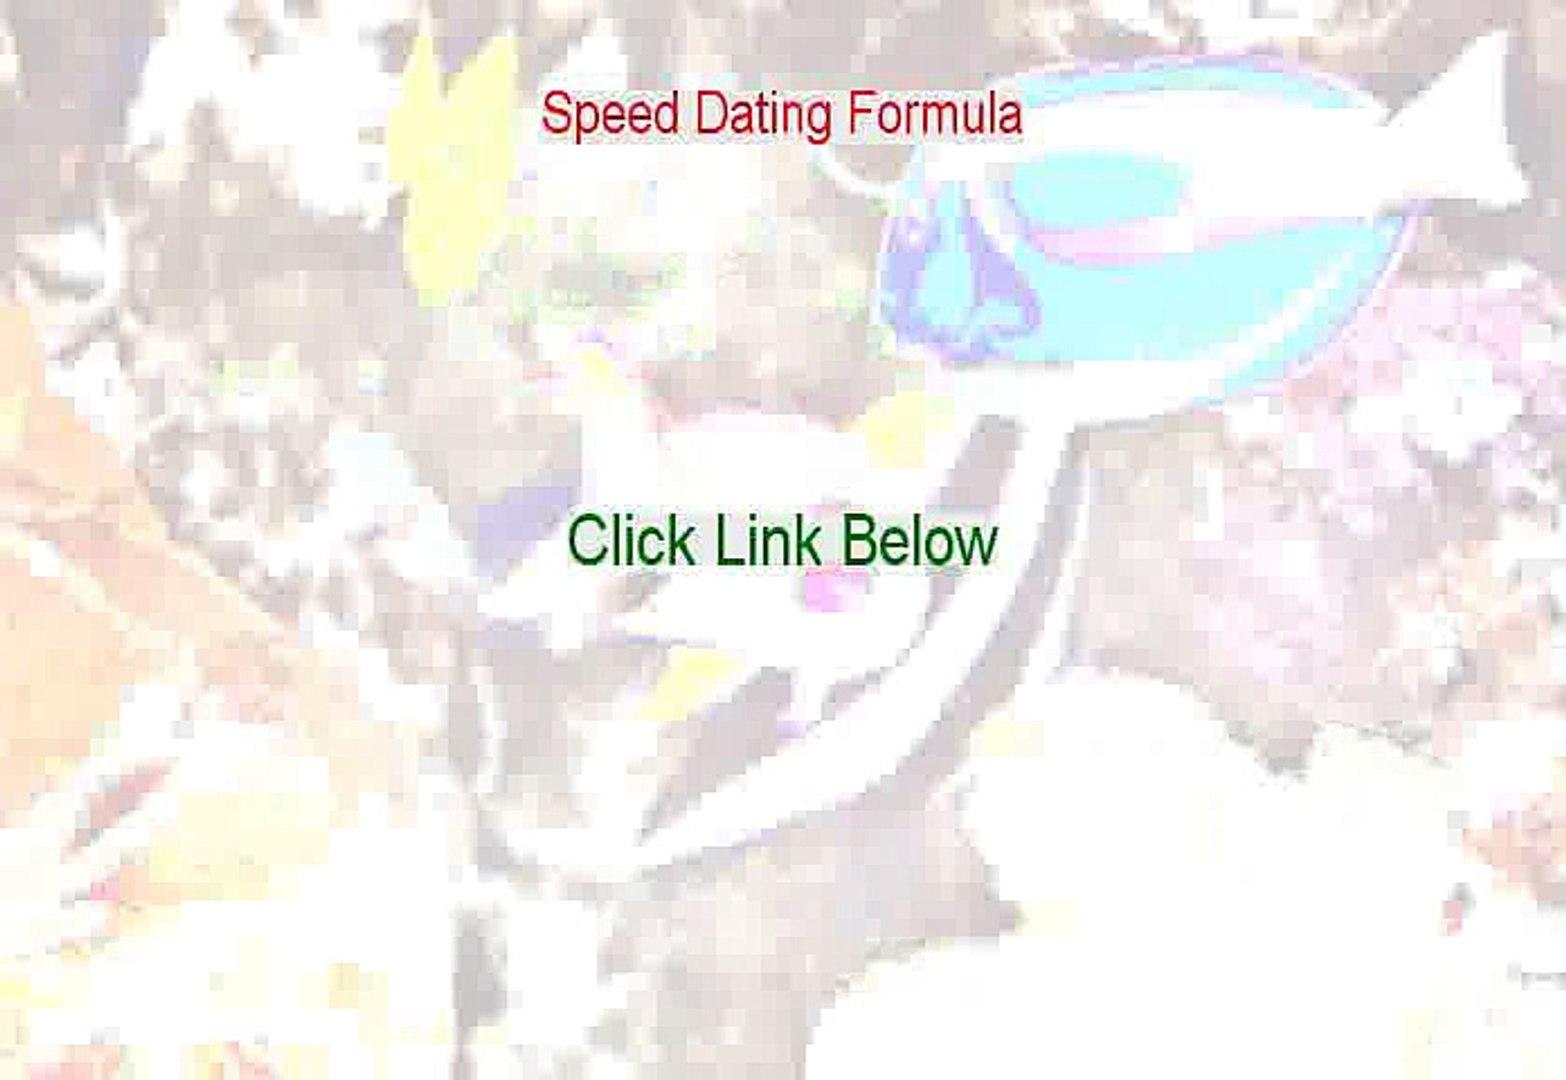 Olen dating jään prinsessa pehmeä kopio Download